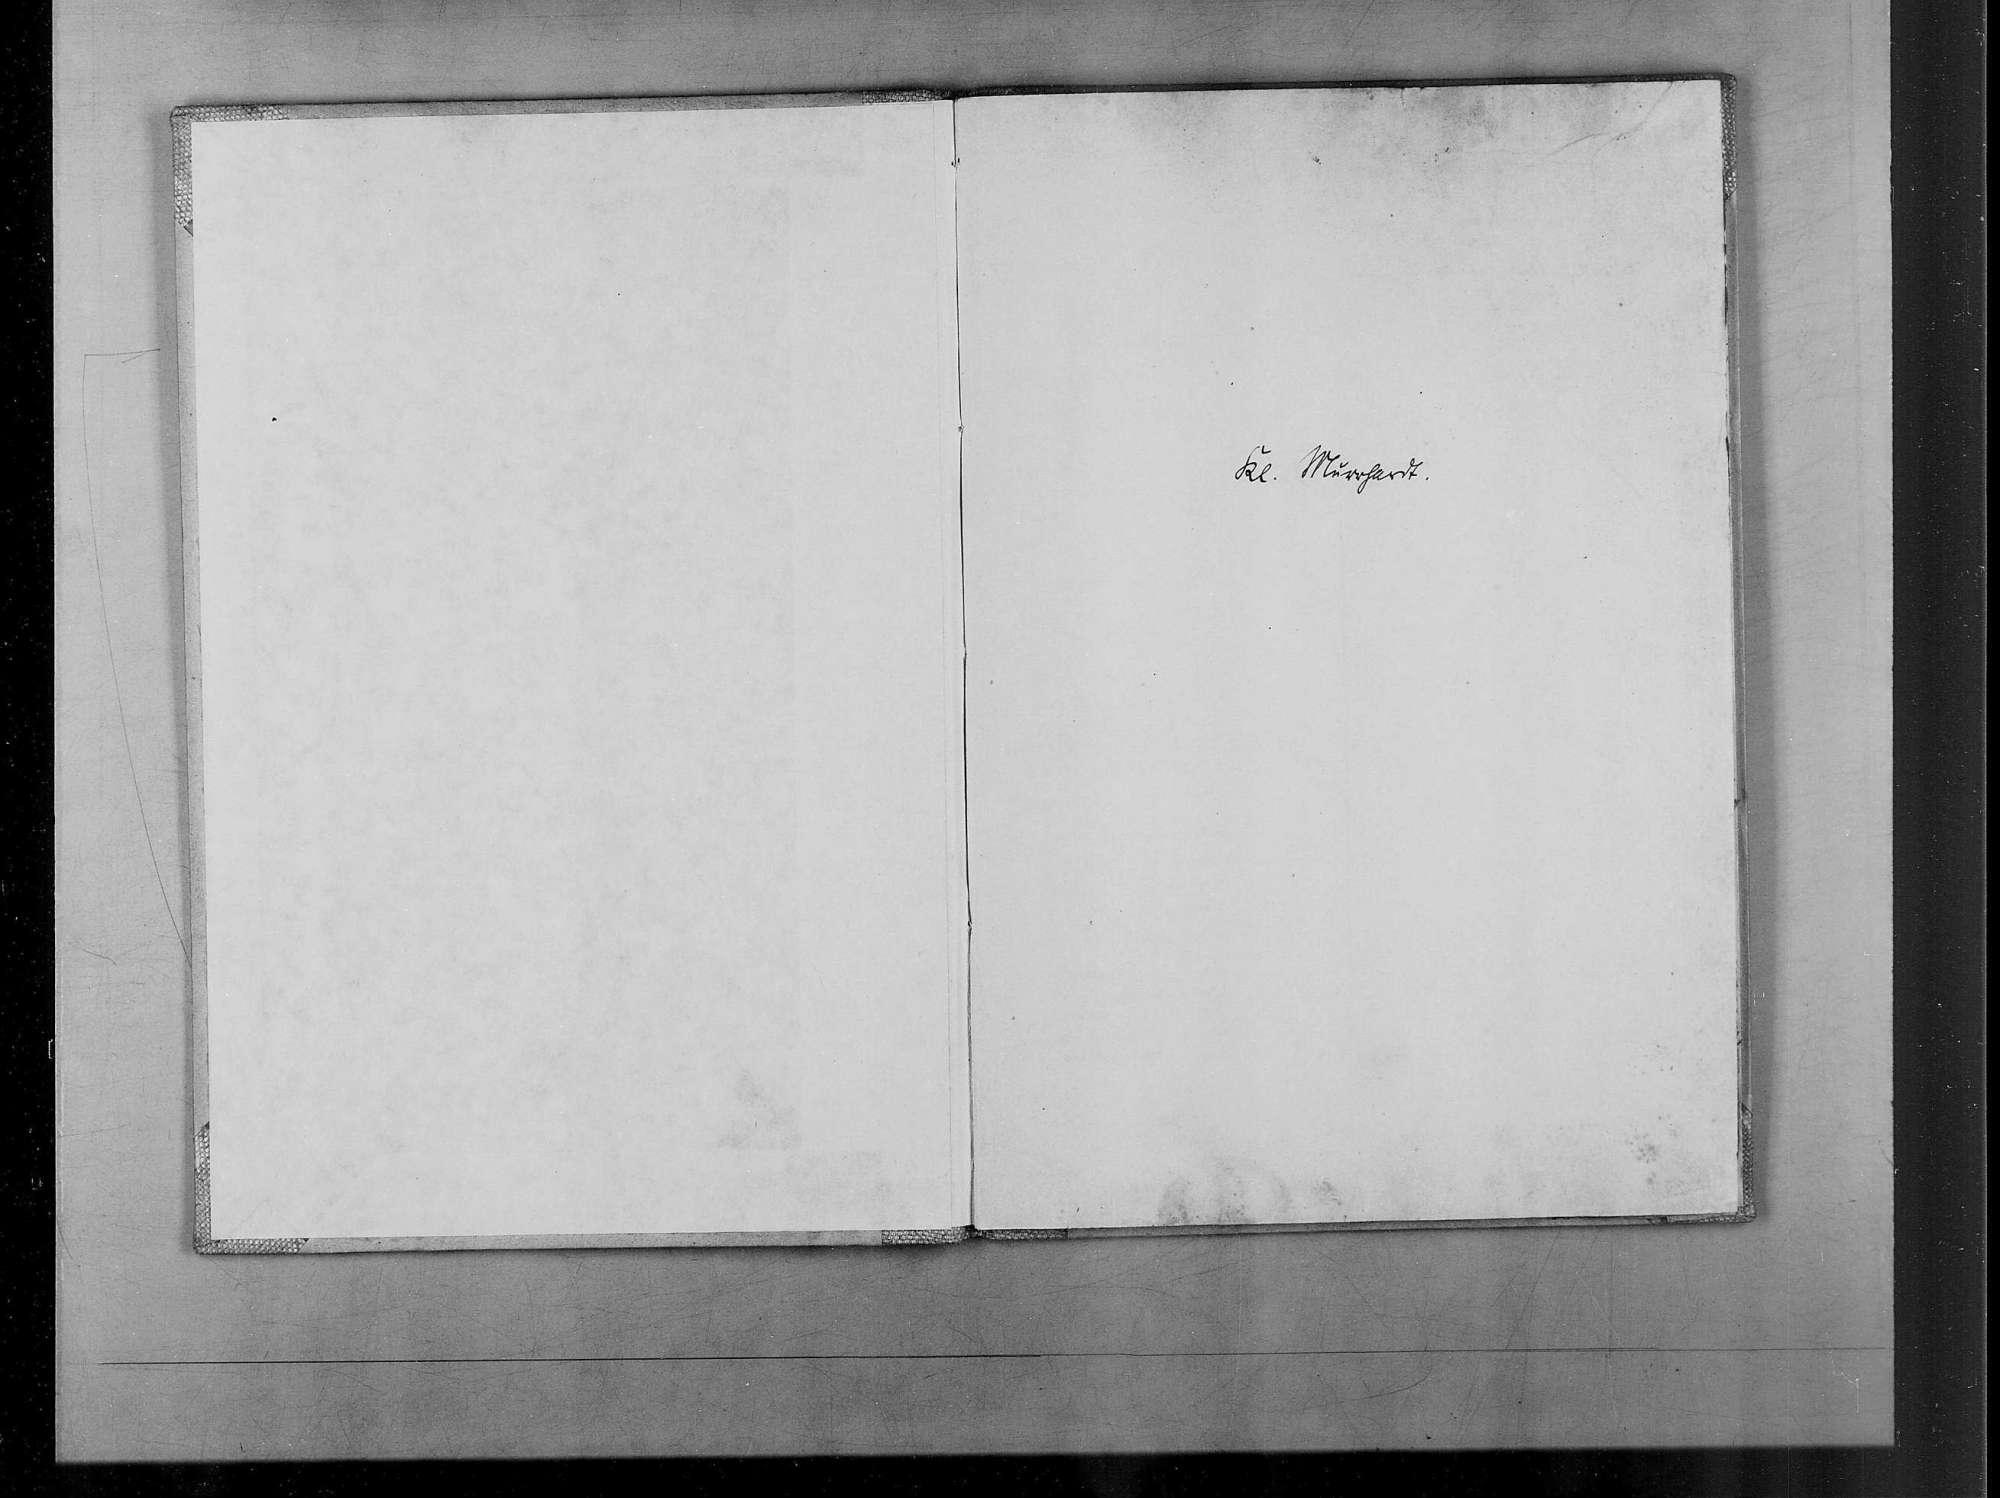 Kl. Murrhardt, Bild 2